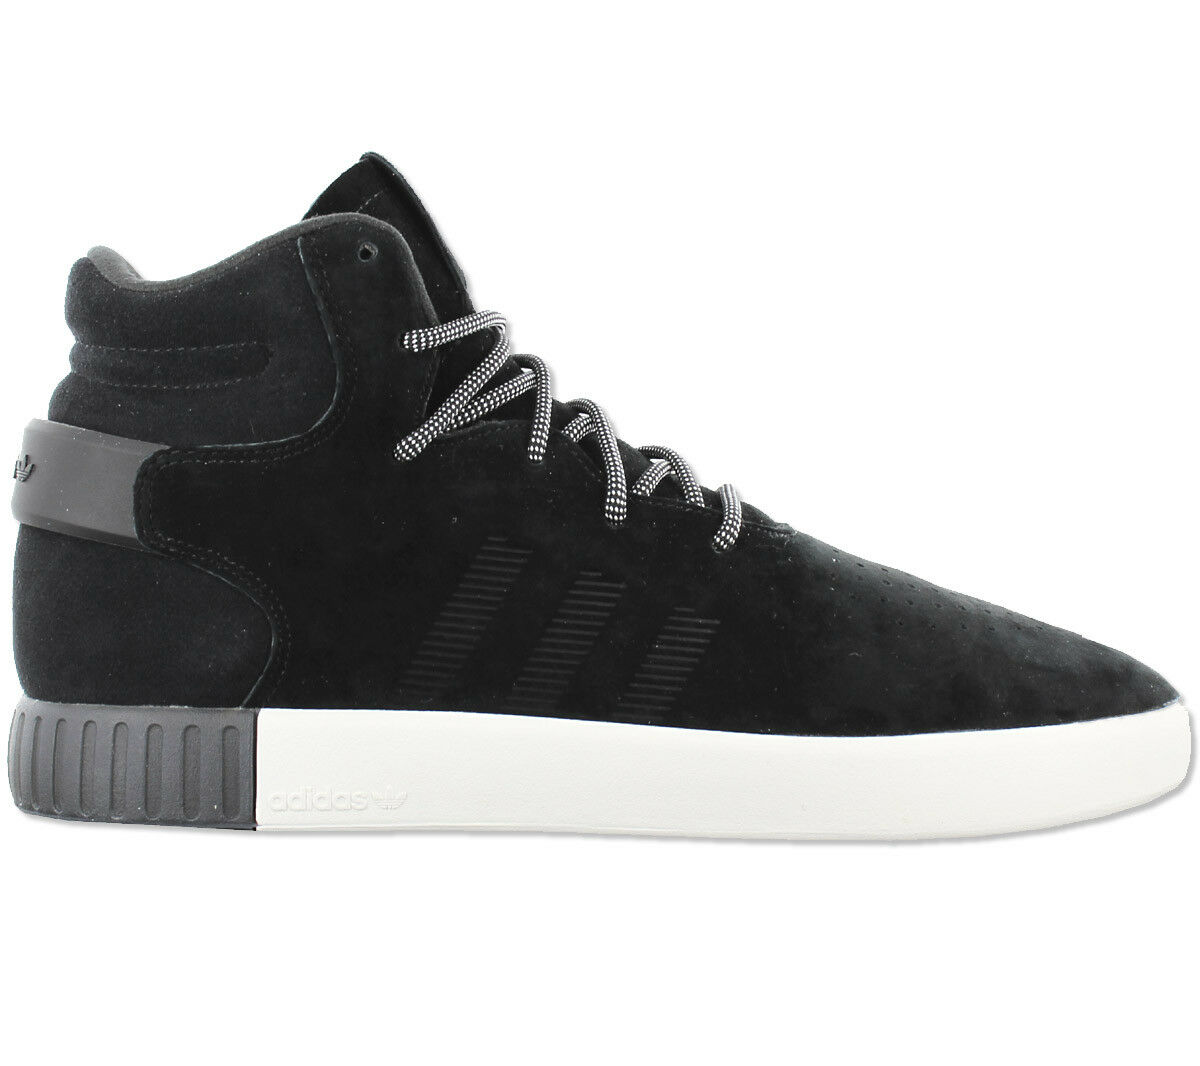 Adidas Originals TUBULAR TUBULAR TUBULAR Turnschuhe Schuhe Turnschuhe Freizeit Low Mid High SALE  |   c8edcc